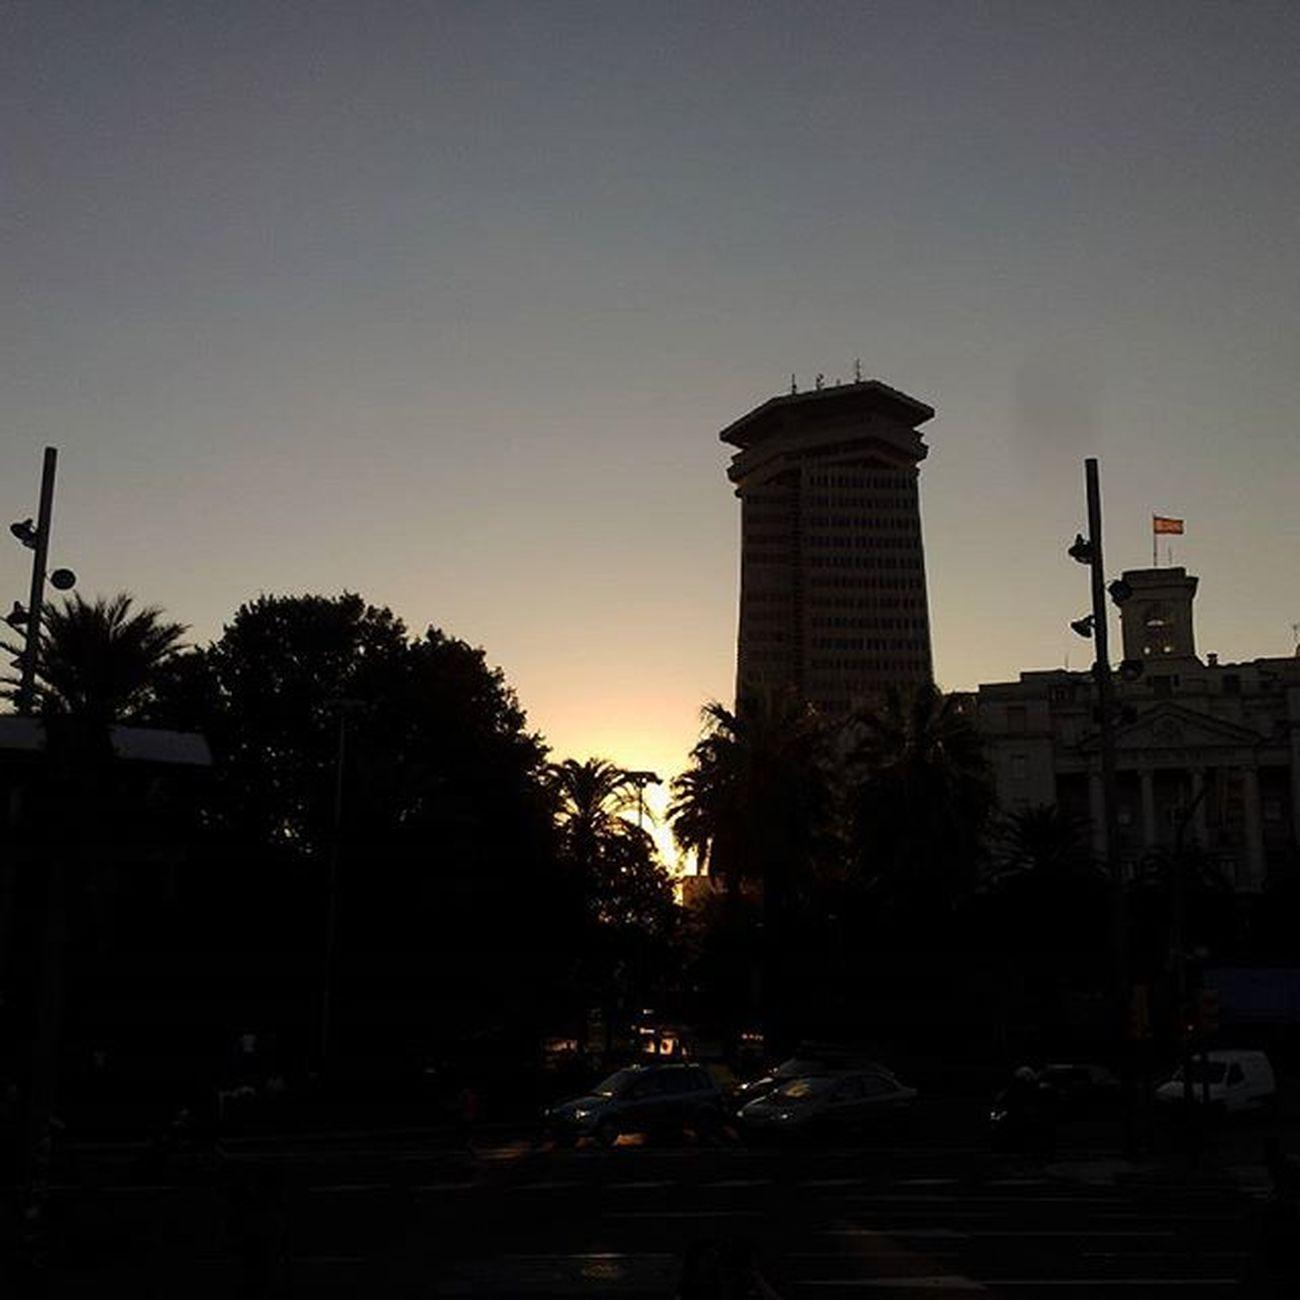 Barcelona Portbarcelona Sunset Building dark sun flag trees